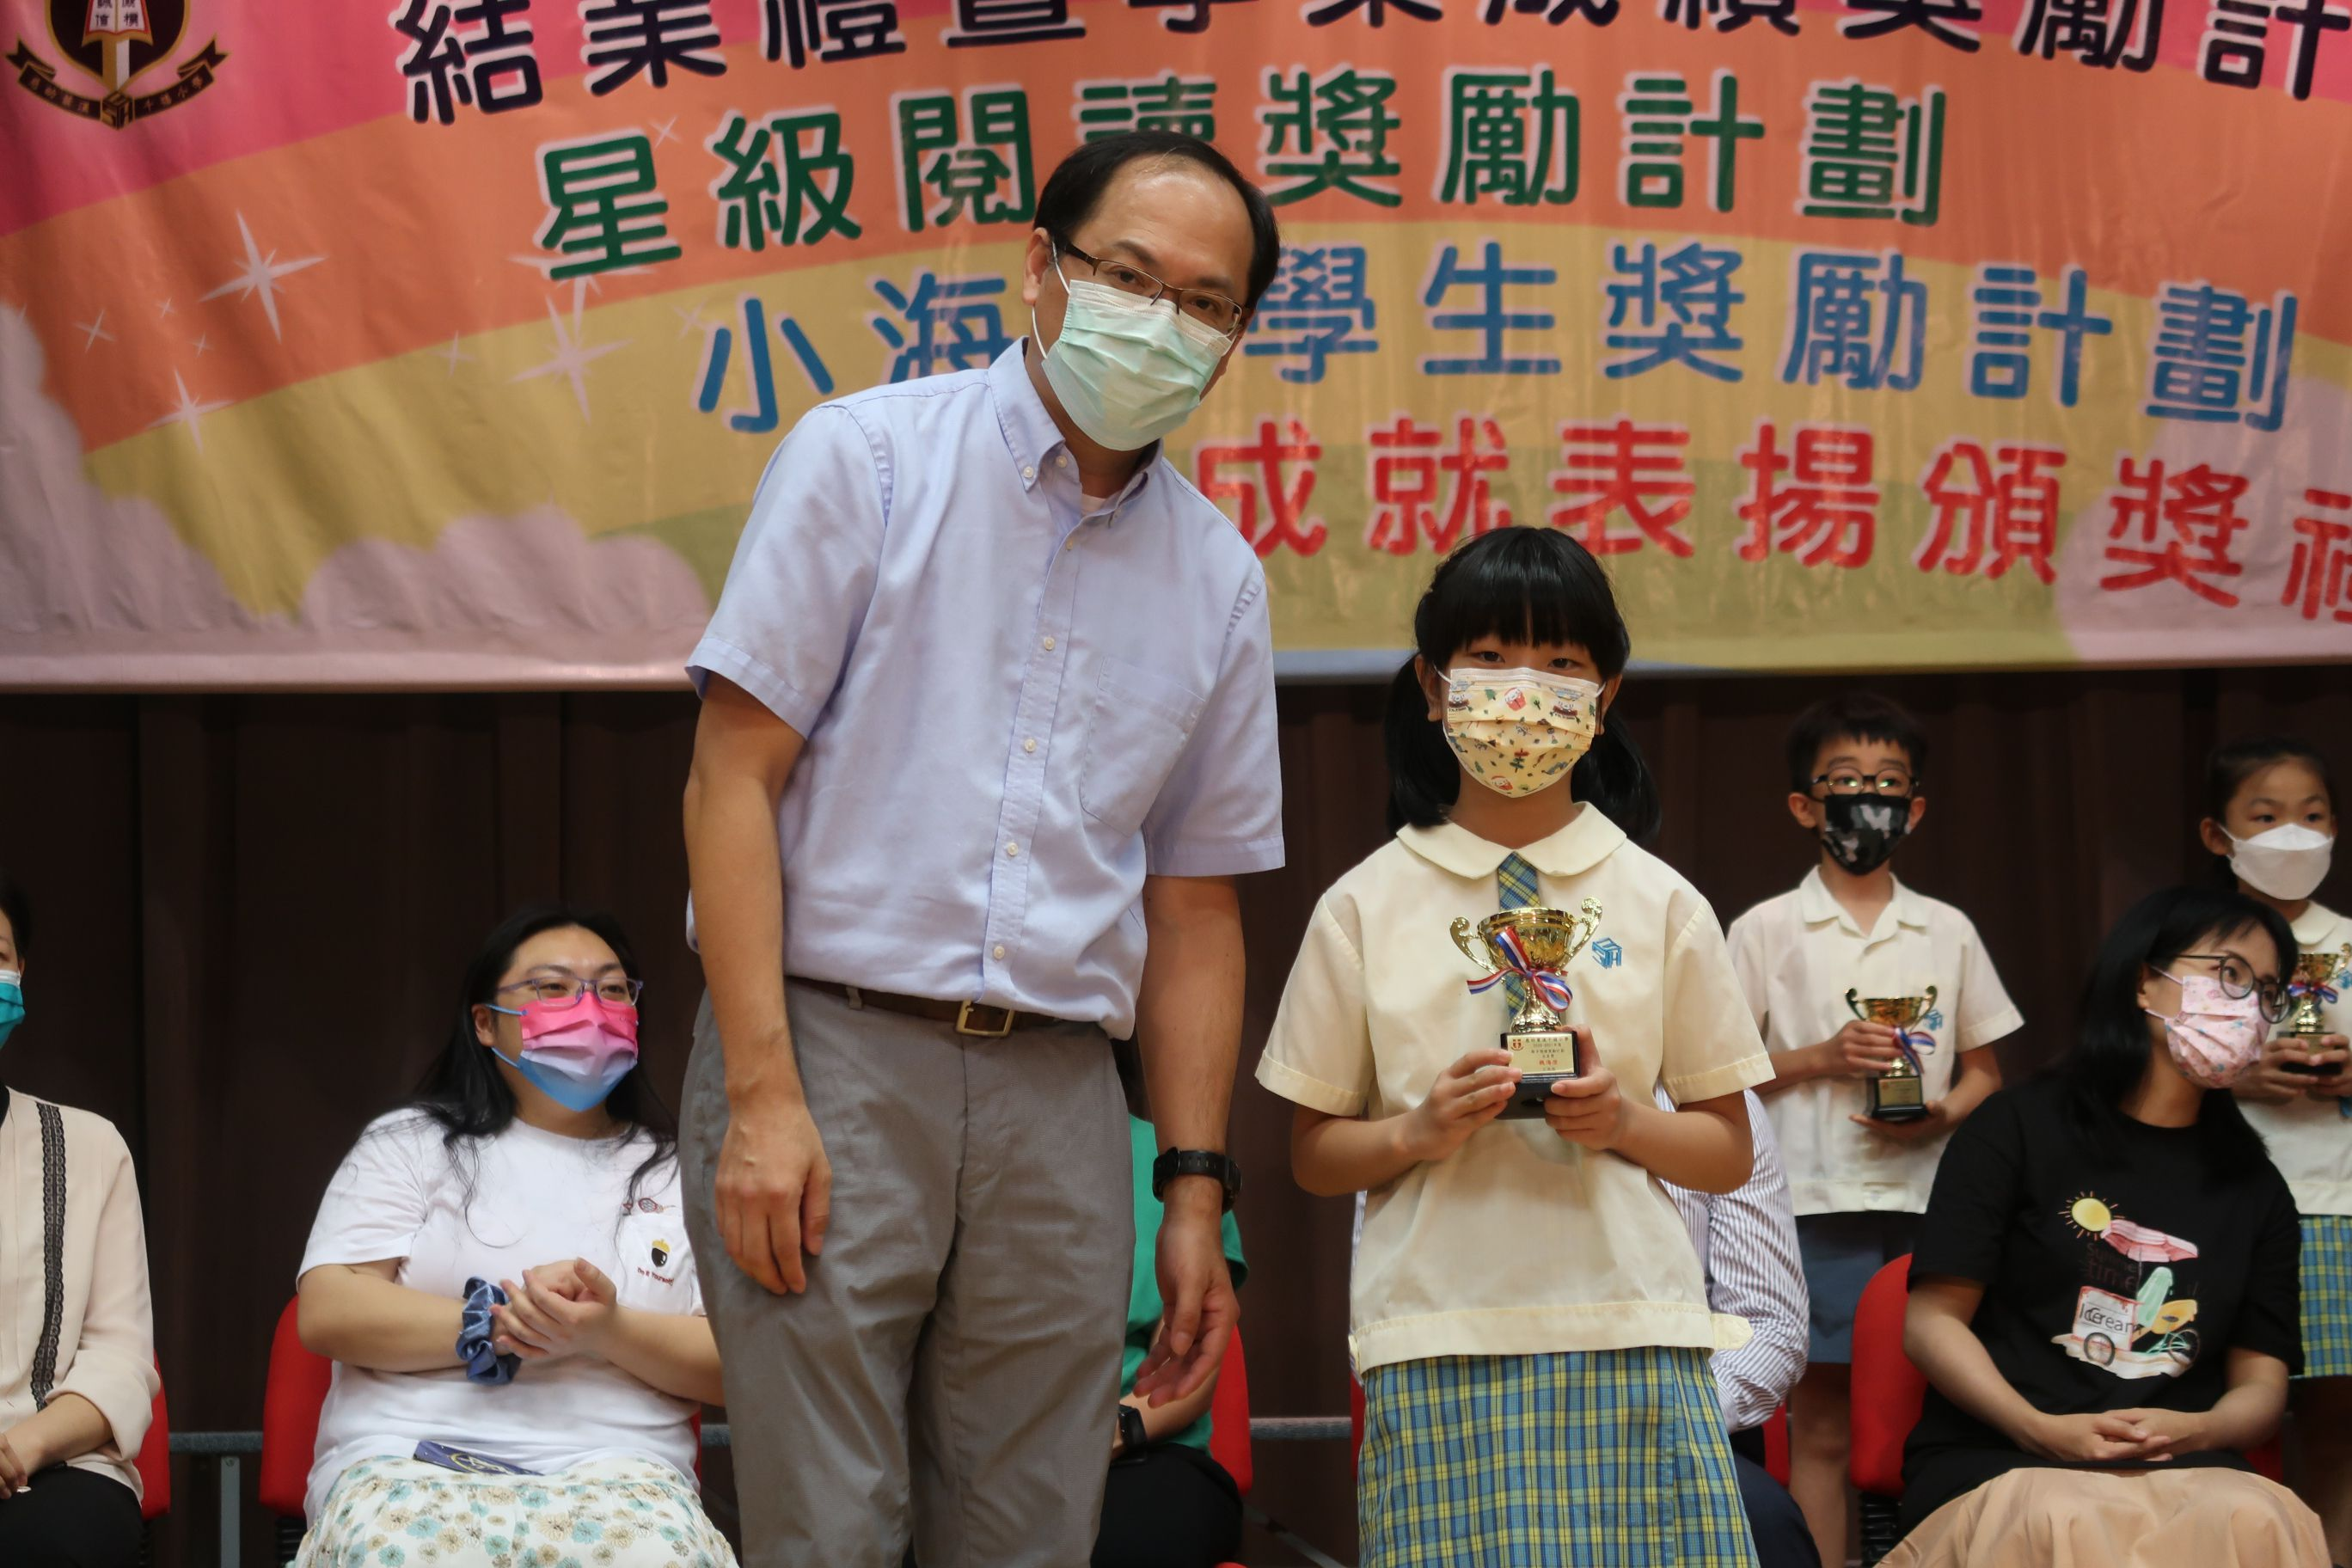 https://syh.edu.hk/sites/default/files/img_5844.jpg